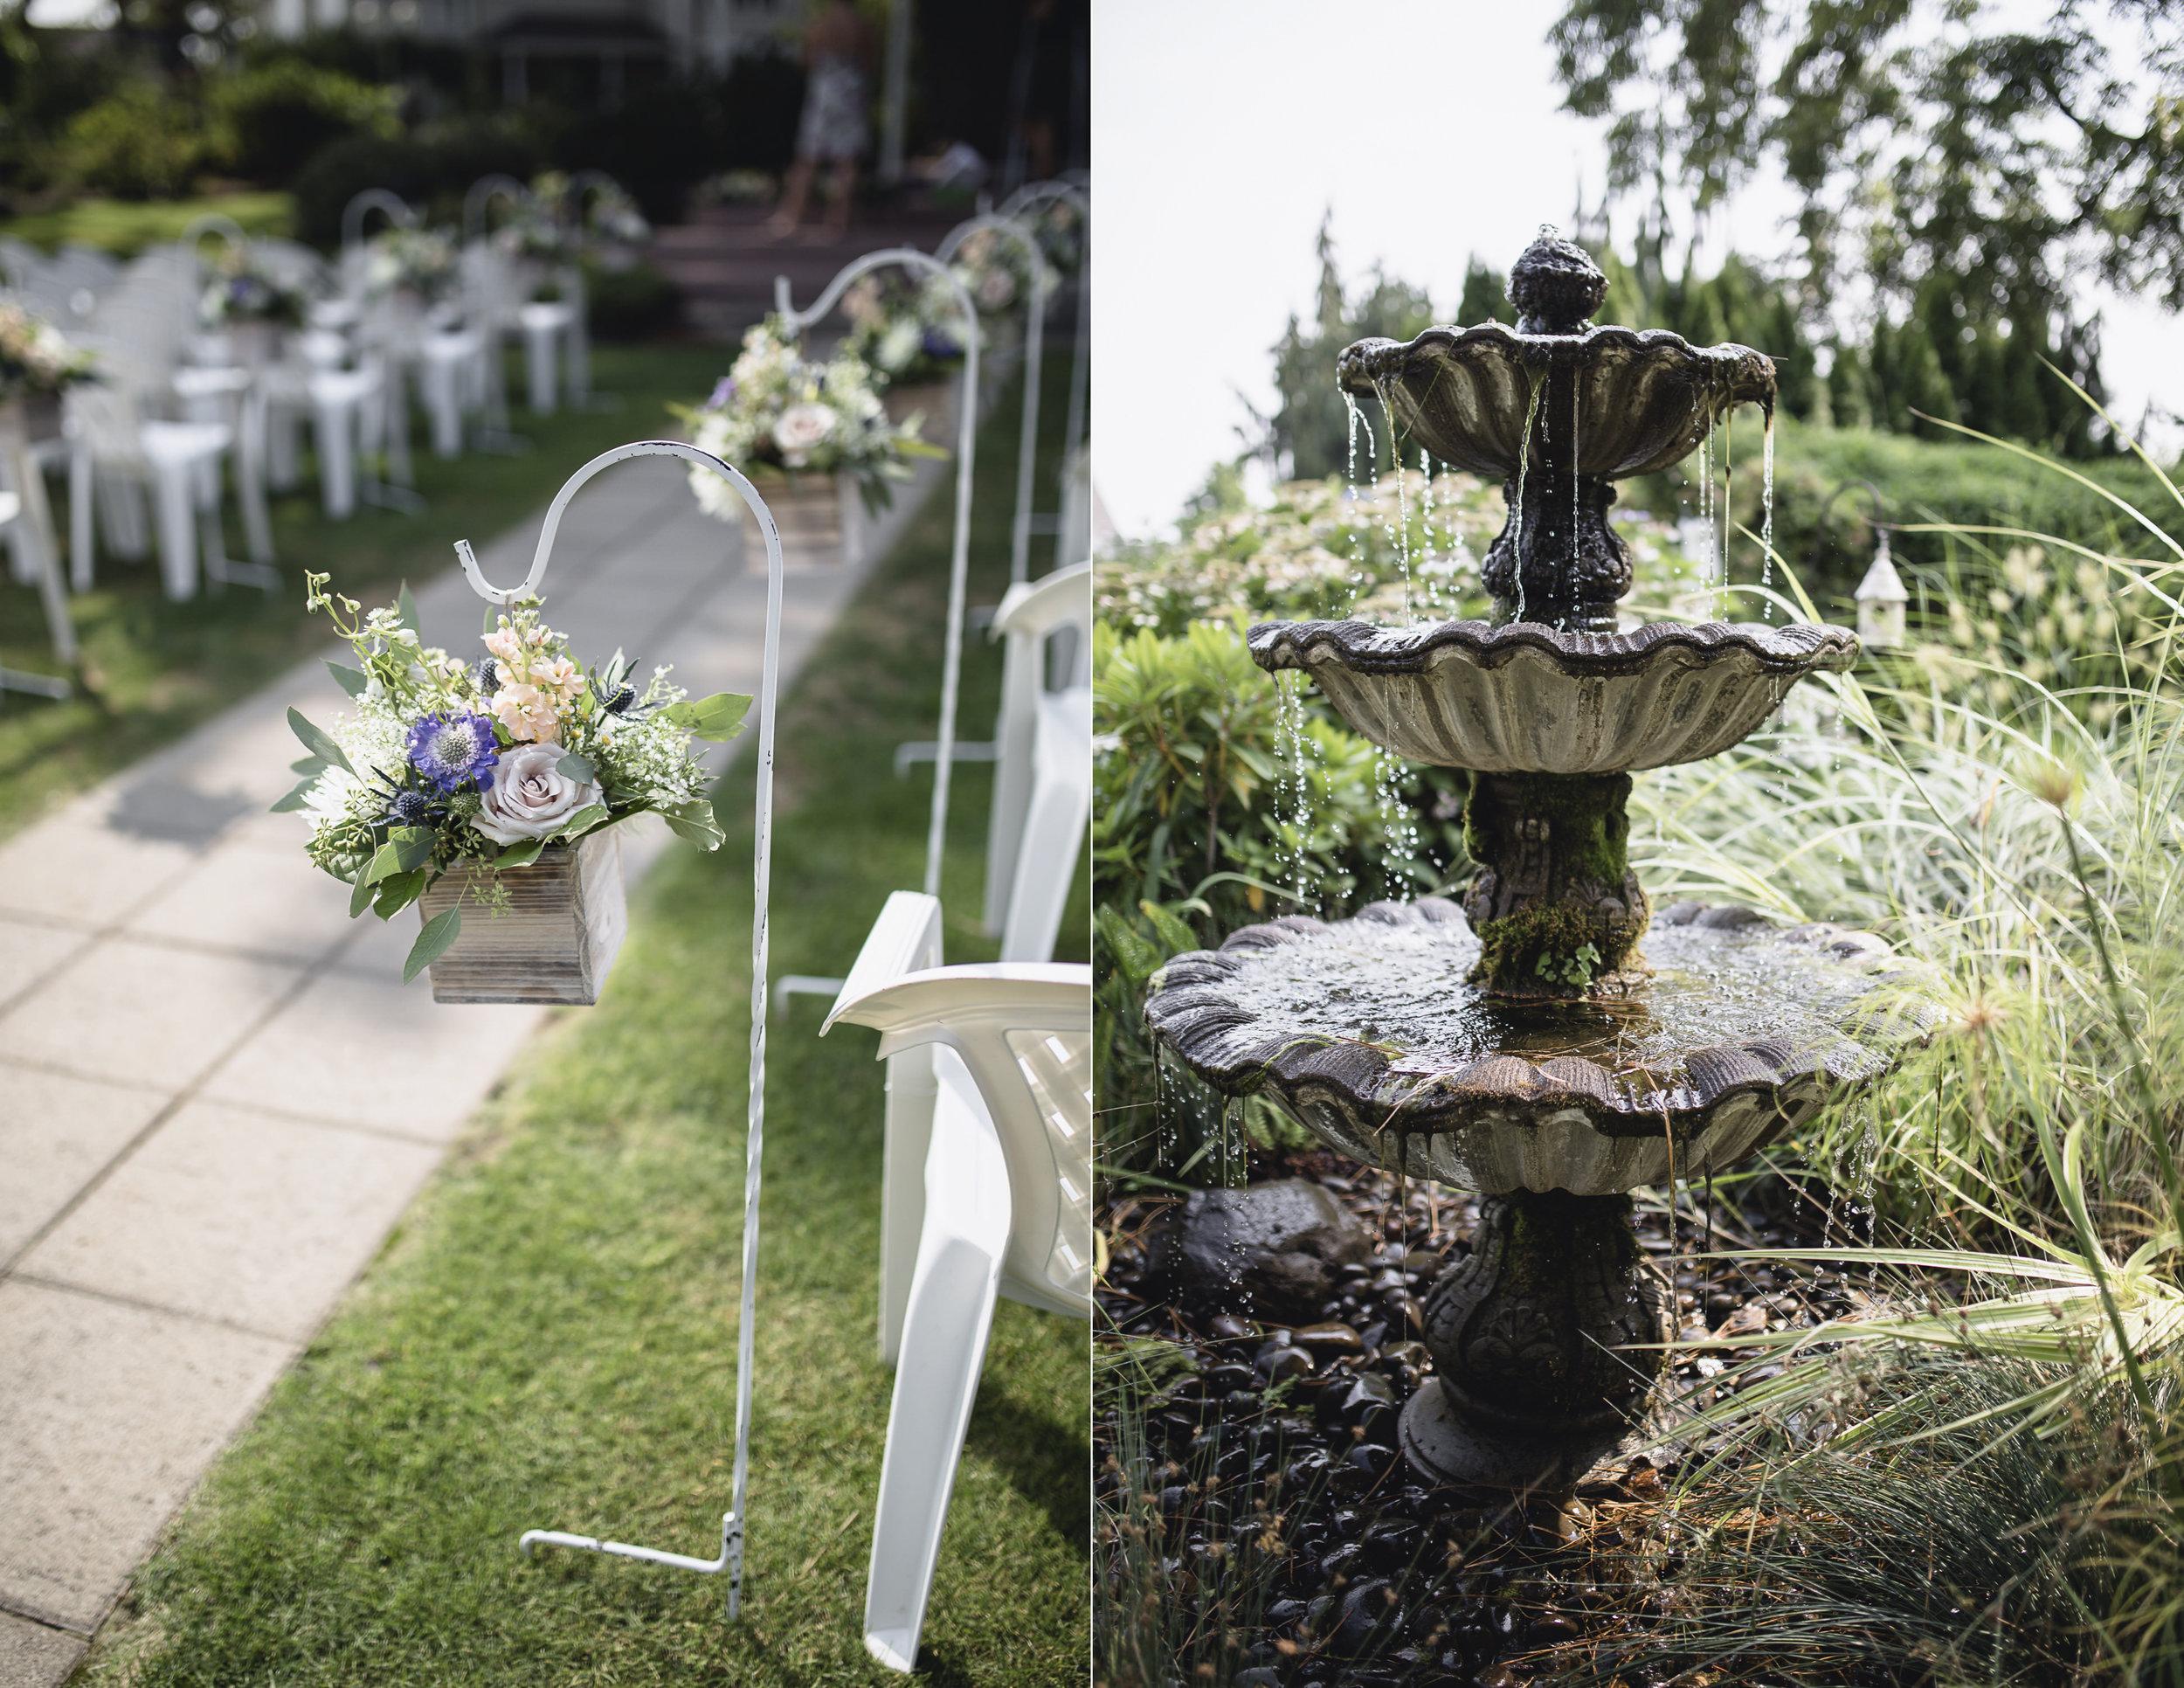 Ainsworth house wedding venue oregon city portland oregon photographer maccoy dean fine art 5.jpg